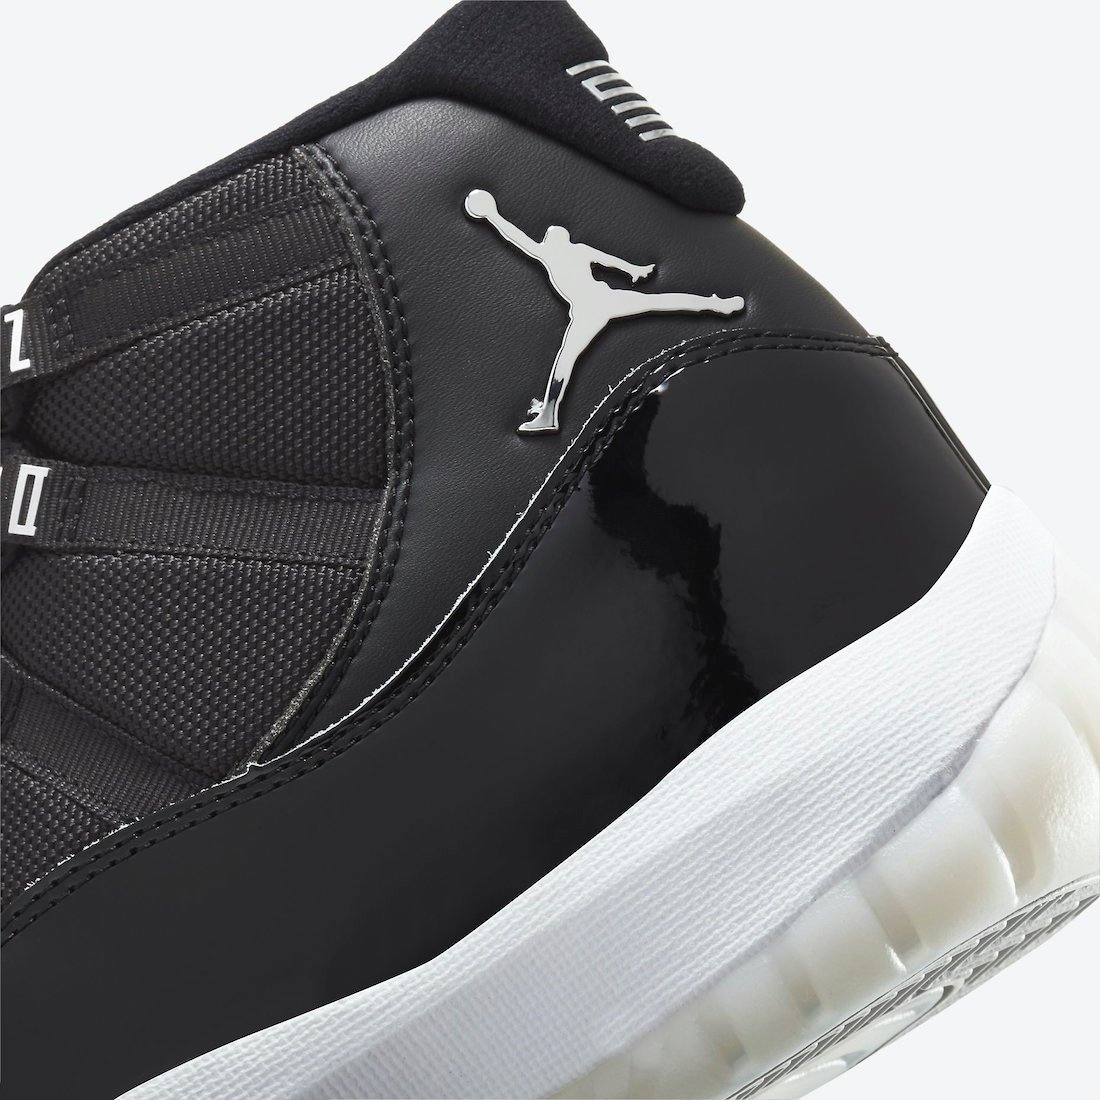 Air Jordan 11 Jubilee 25th Anniversary CT8012-011 Release Date Info